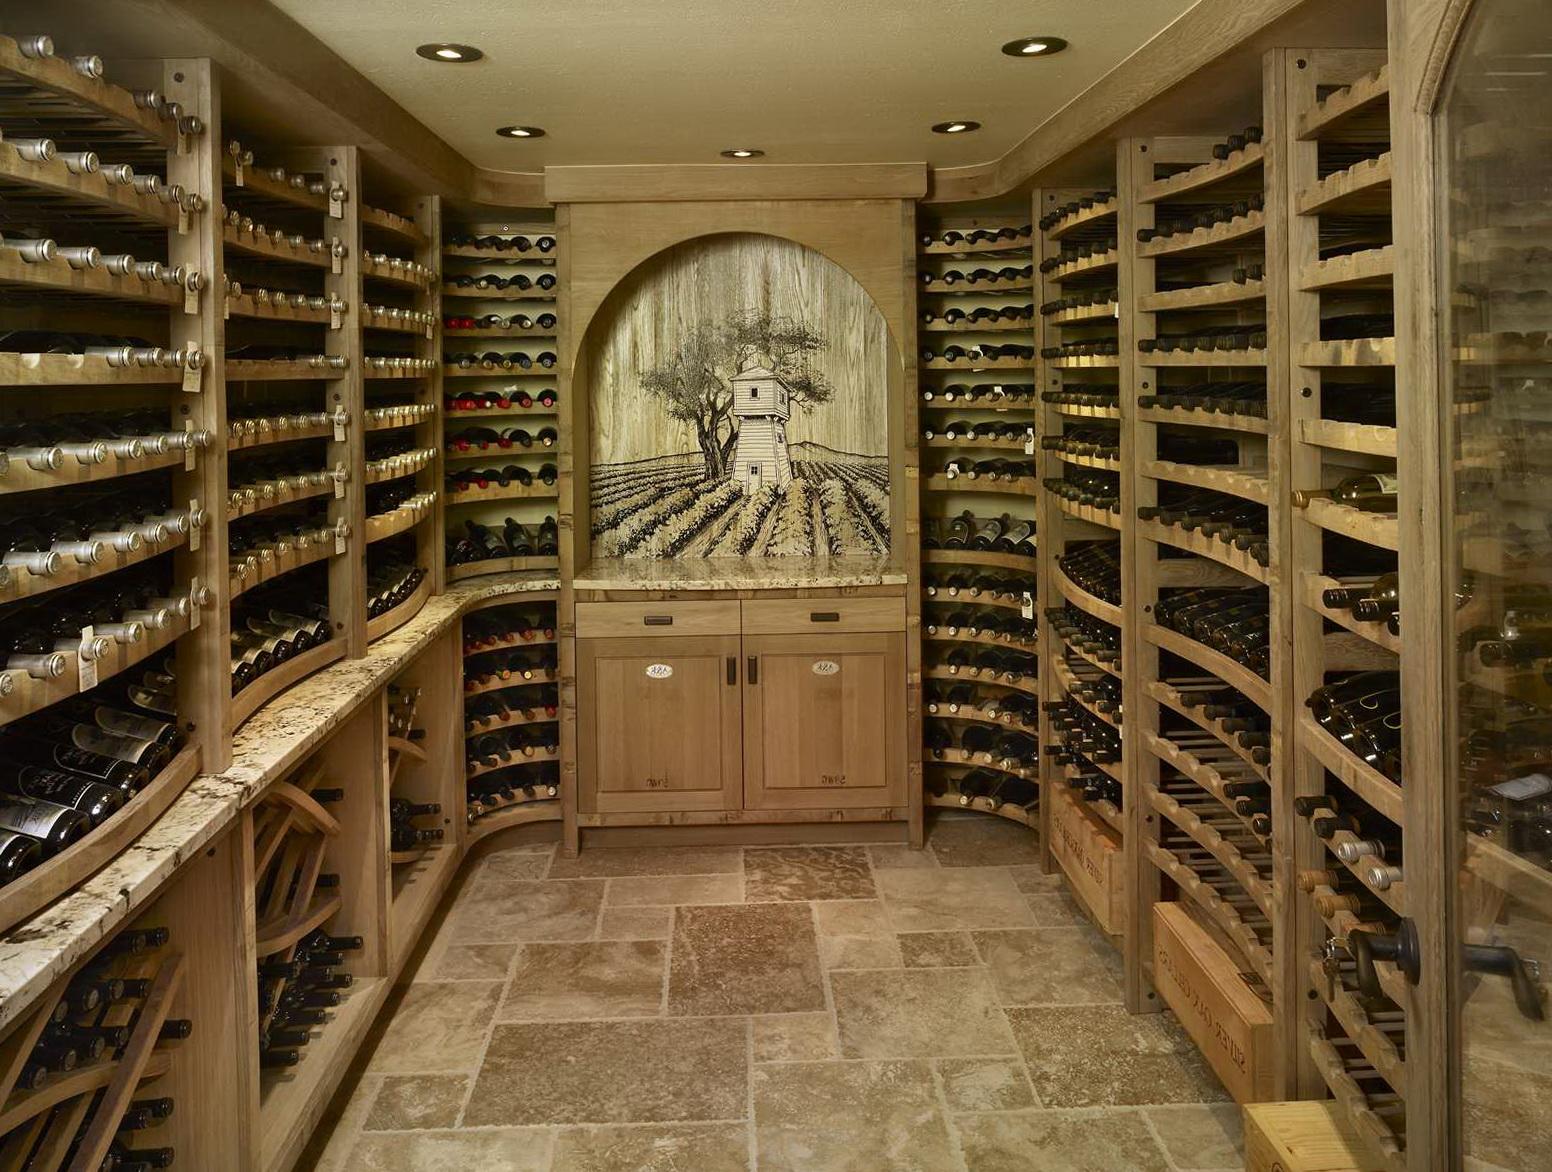 Martin Wine Cellar New Orleans & Martin Wine Cellar New Orleans | Home Design Ideas